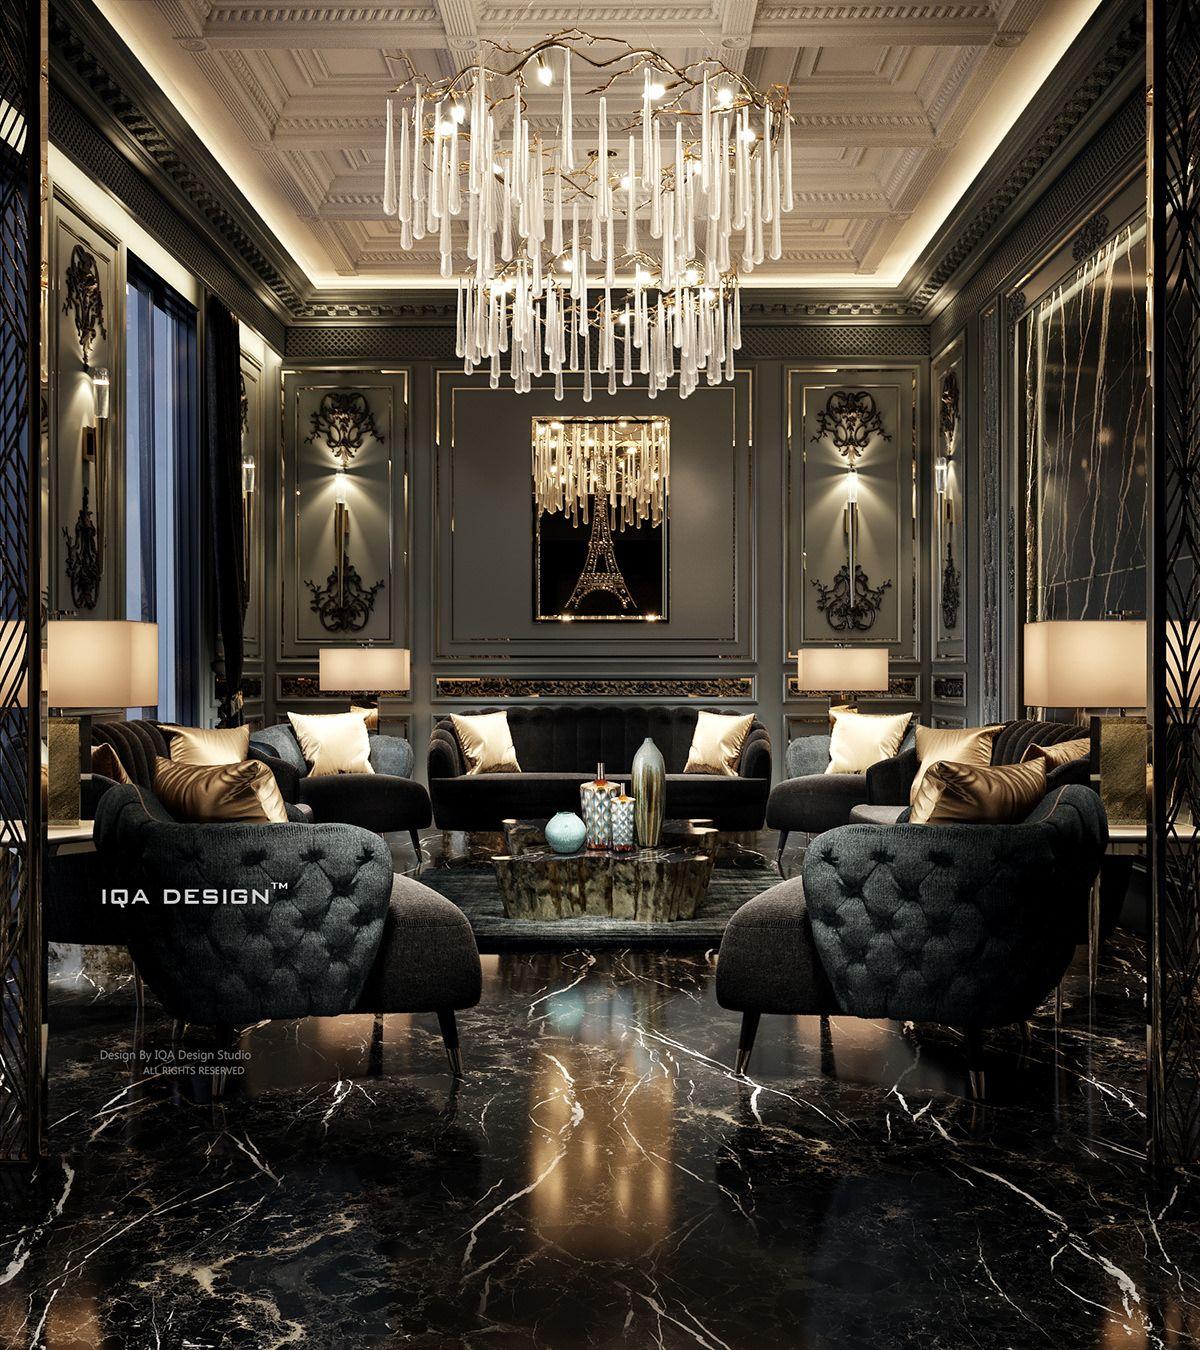 Luxury Living Room Dubai On Behance In 2020 Luxury Living Room Design Luxury Living Room Luxury Rooms